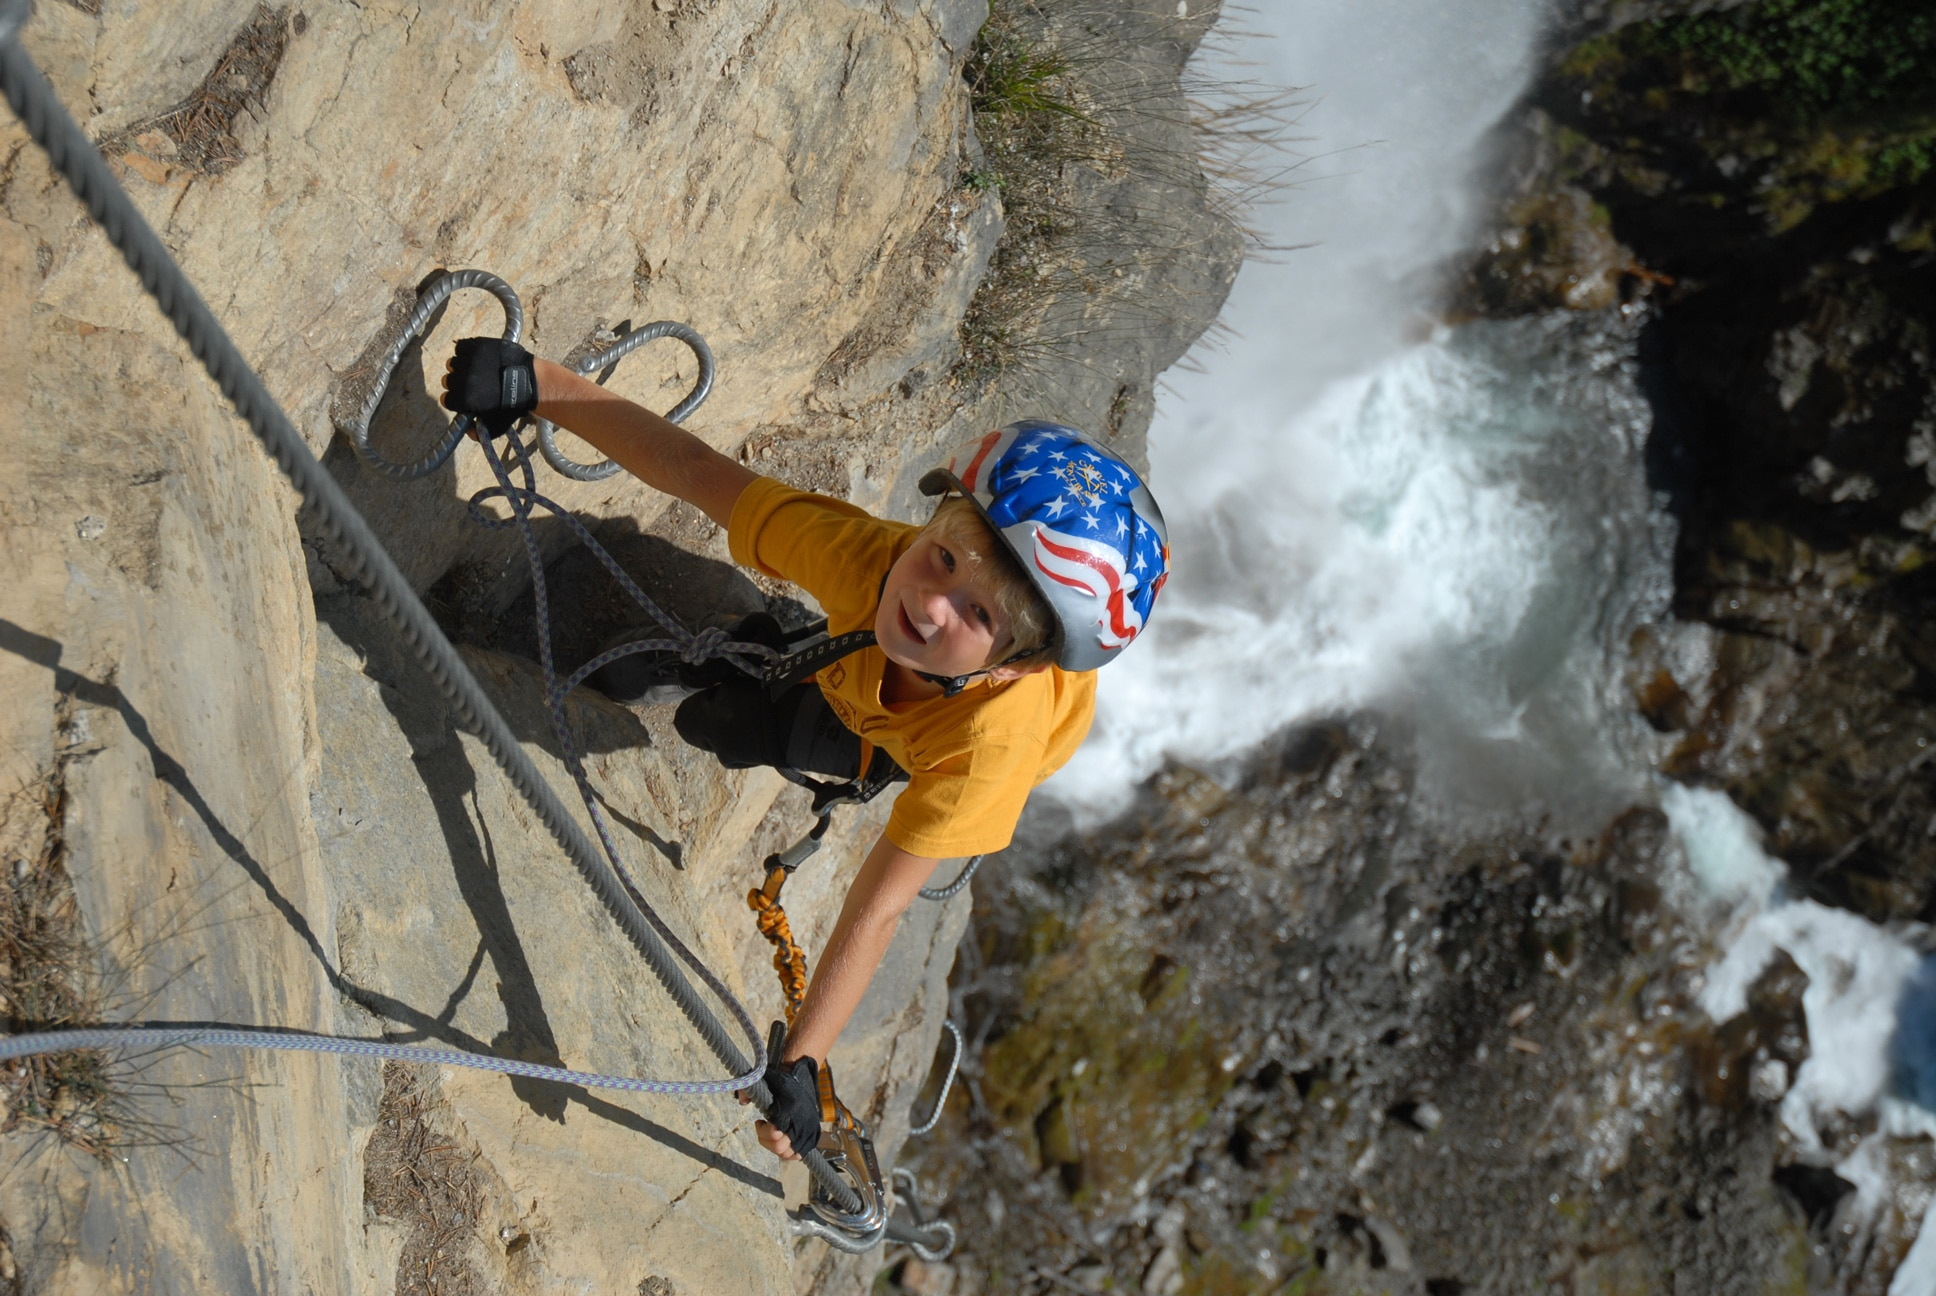 Klettersteig Kinder : Tipps vom profi klettersteige mit kindern bergwelten